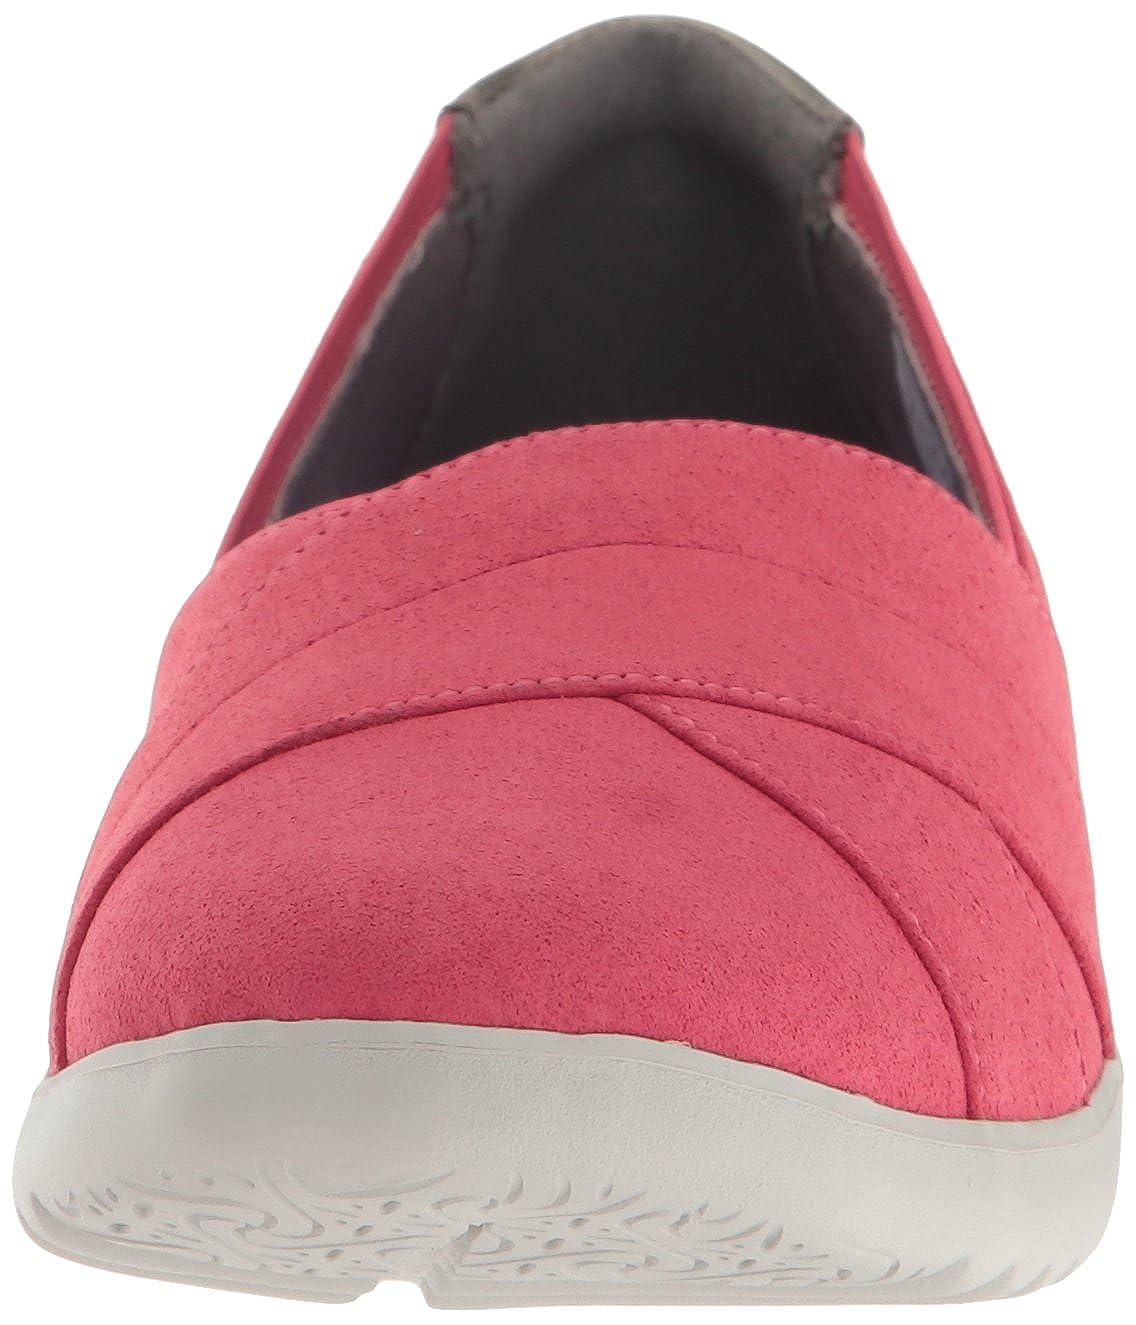 Rockport Womens Emalyn Slip-on Flat